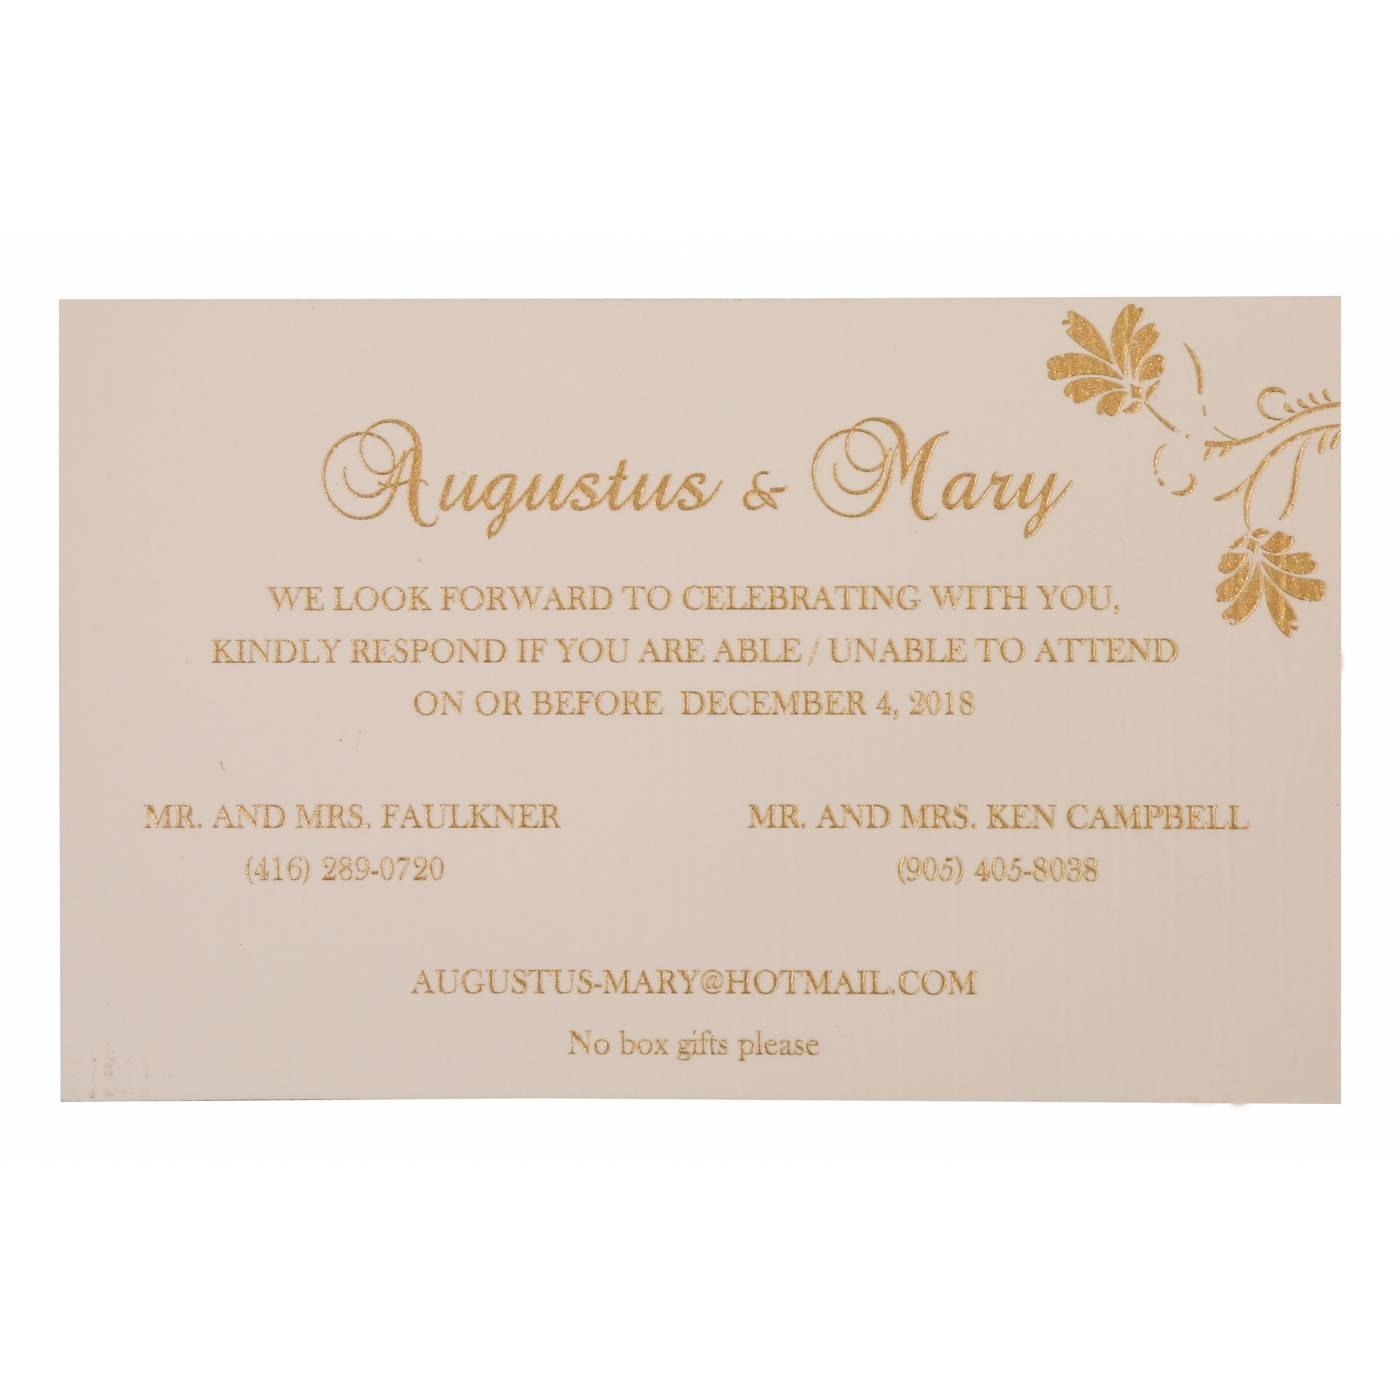 BEIGE SHIMMERY SCREEN PRINTED WEDDING INVITATION : CS-803E - IndianWeddingCards